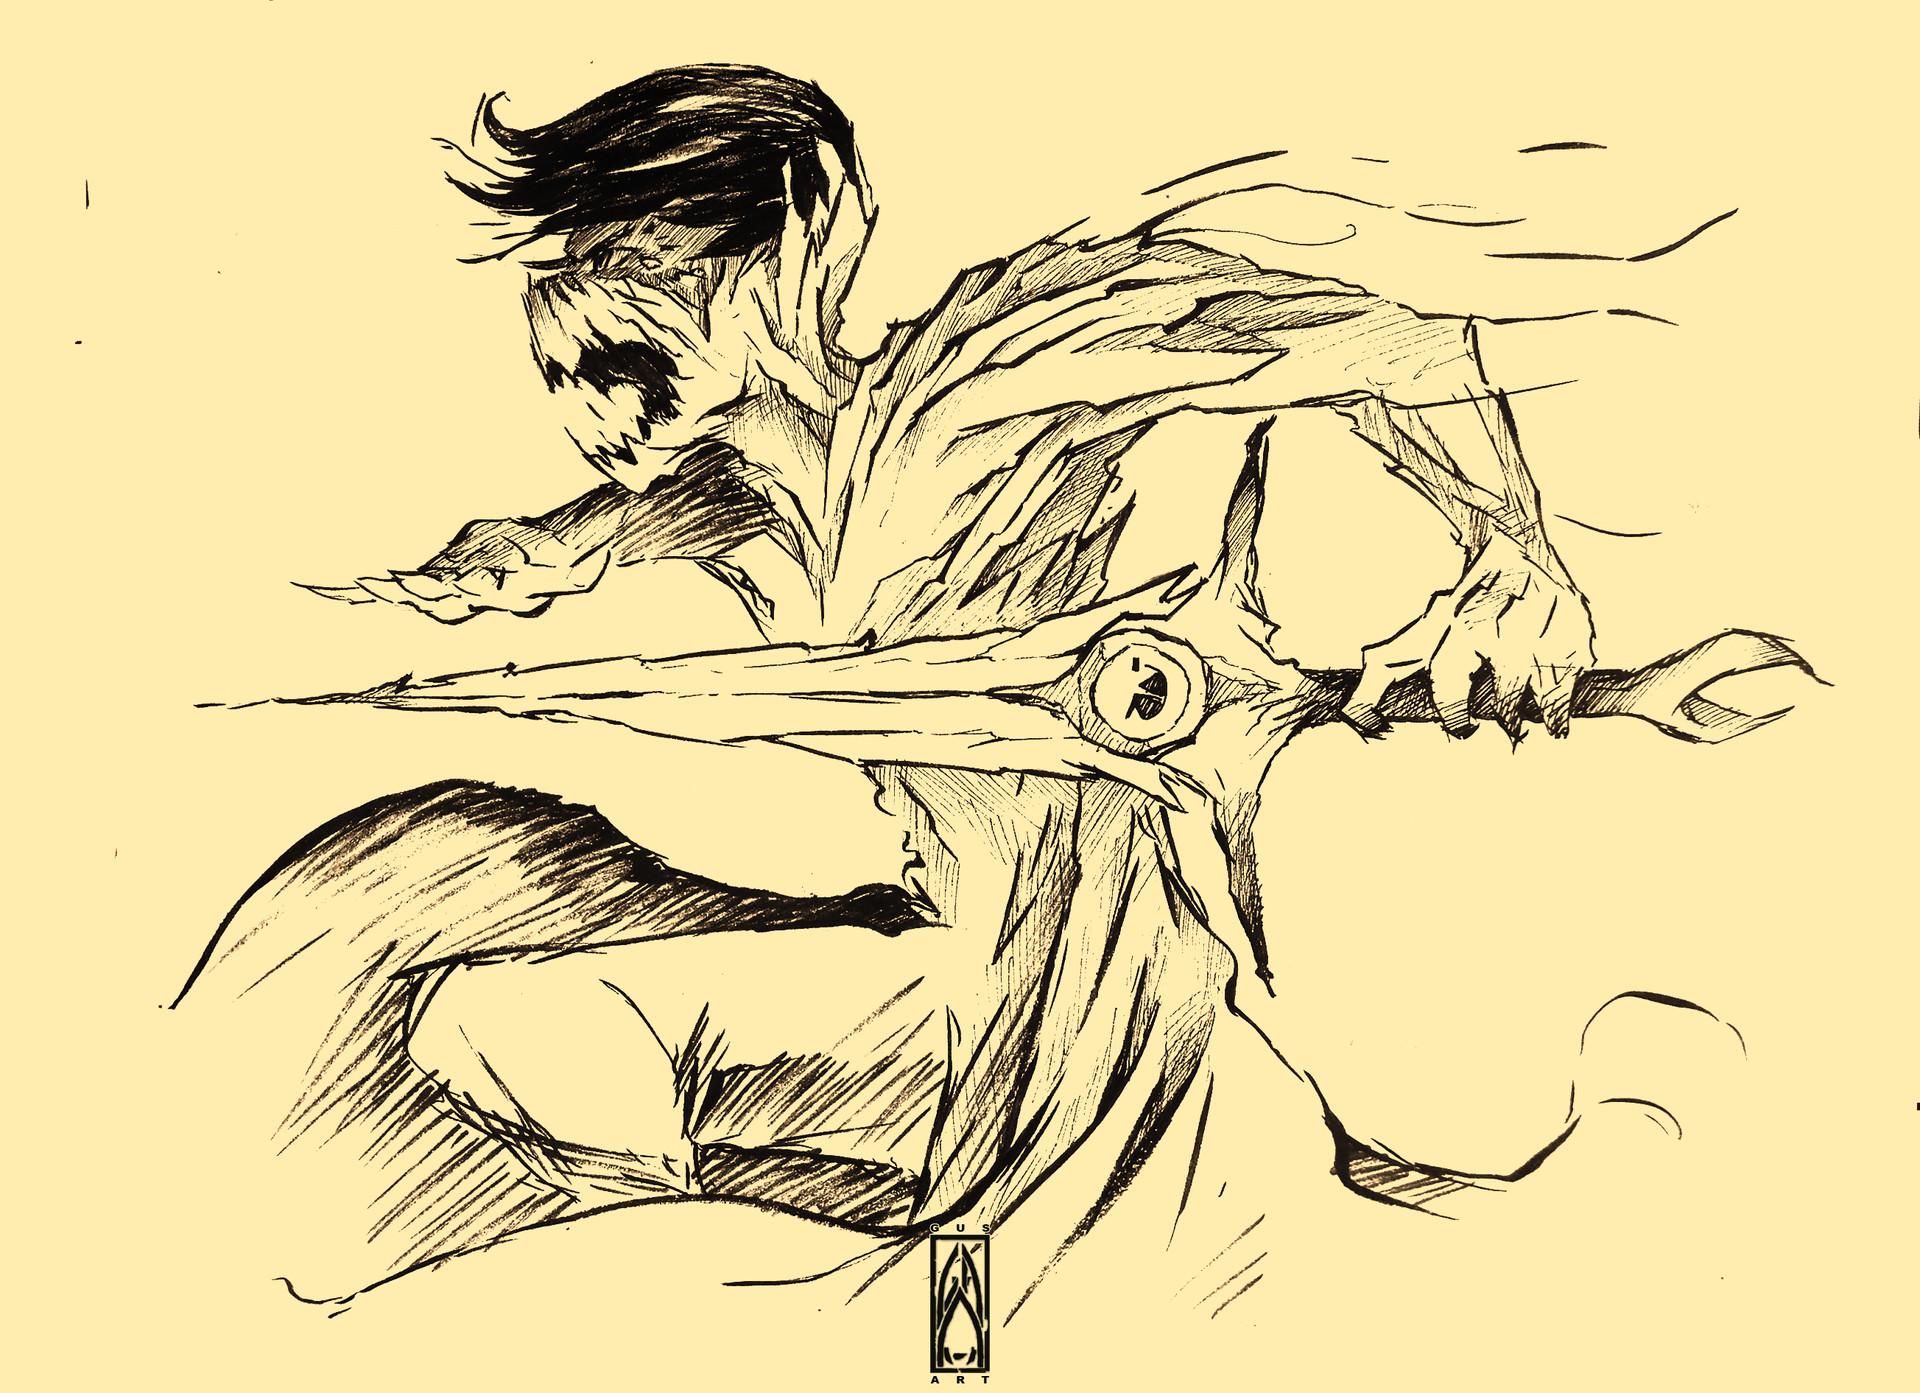 Gustavo arteaga blacksmiths of souls